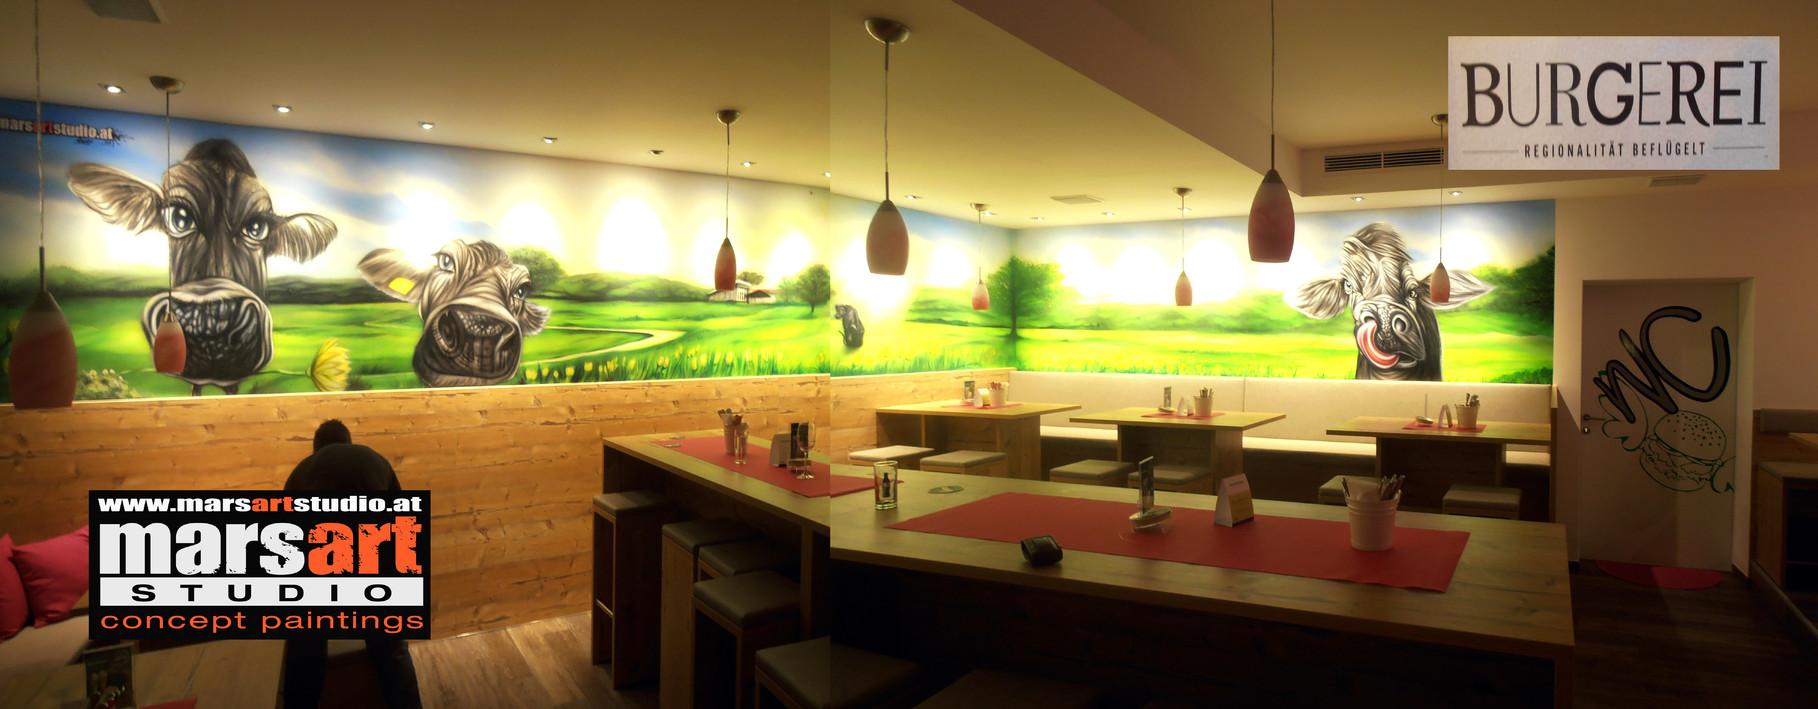 Exklusive Wandmalerei / Burger-Restaurant